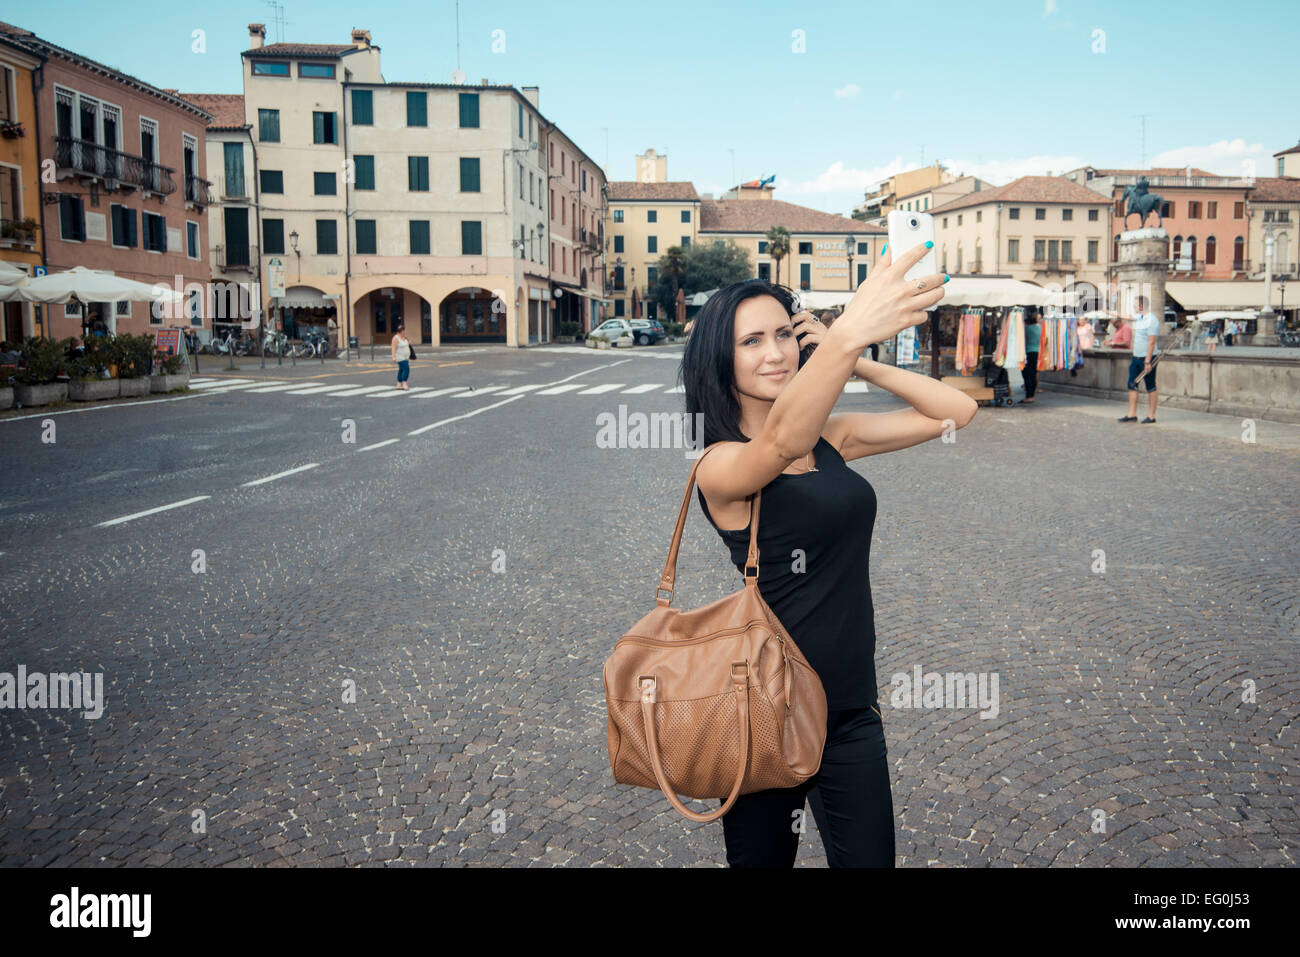 Italy, Padua, Young woman taking selfie - Stock Image